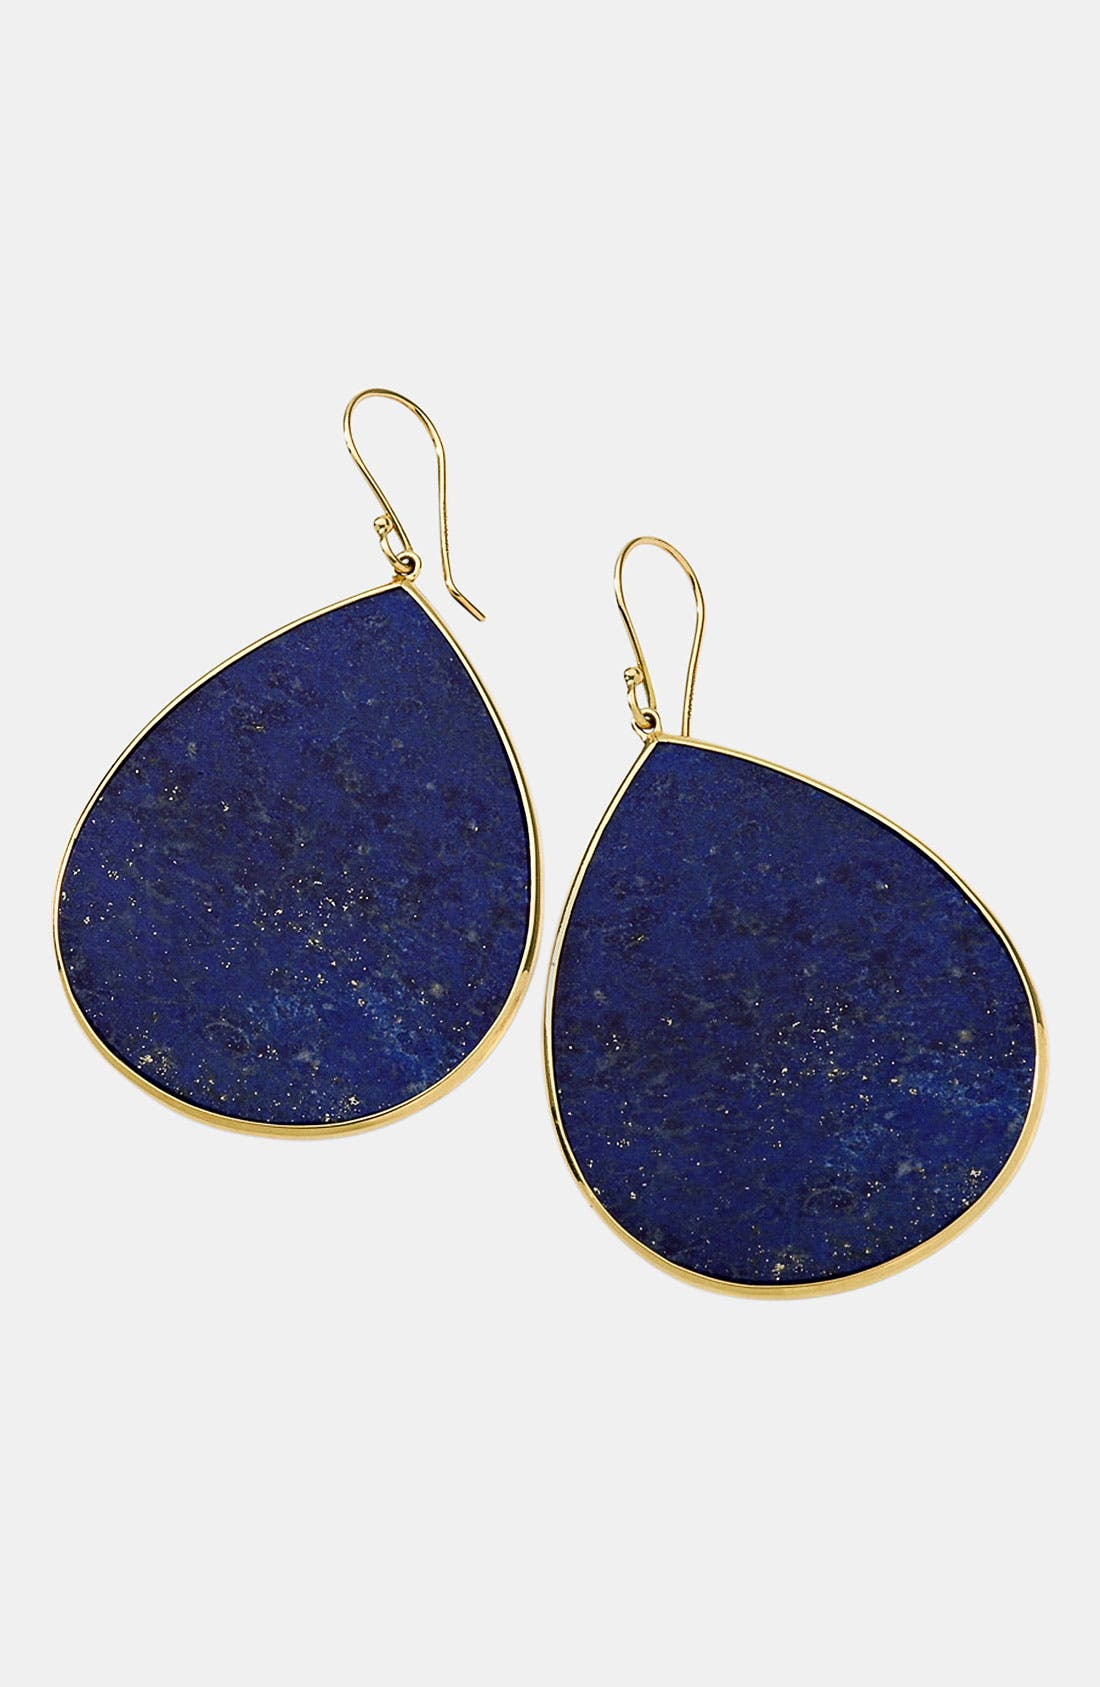 Alternate Image 1 Selected - Ippolita 'Rock Candy - Jumbo Teardrop' 18k Gold Earrings